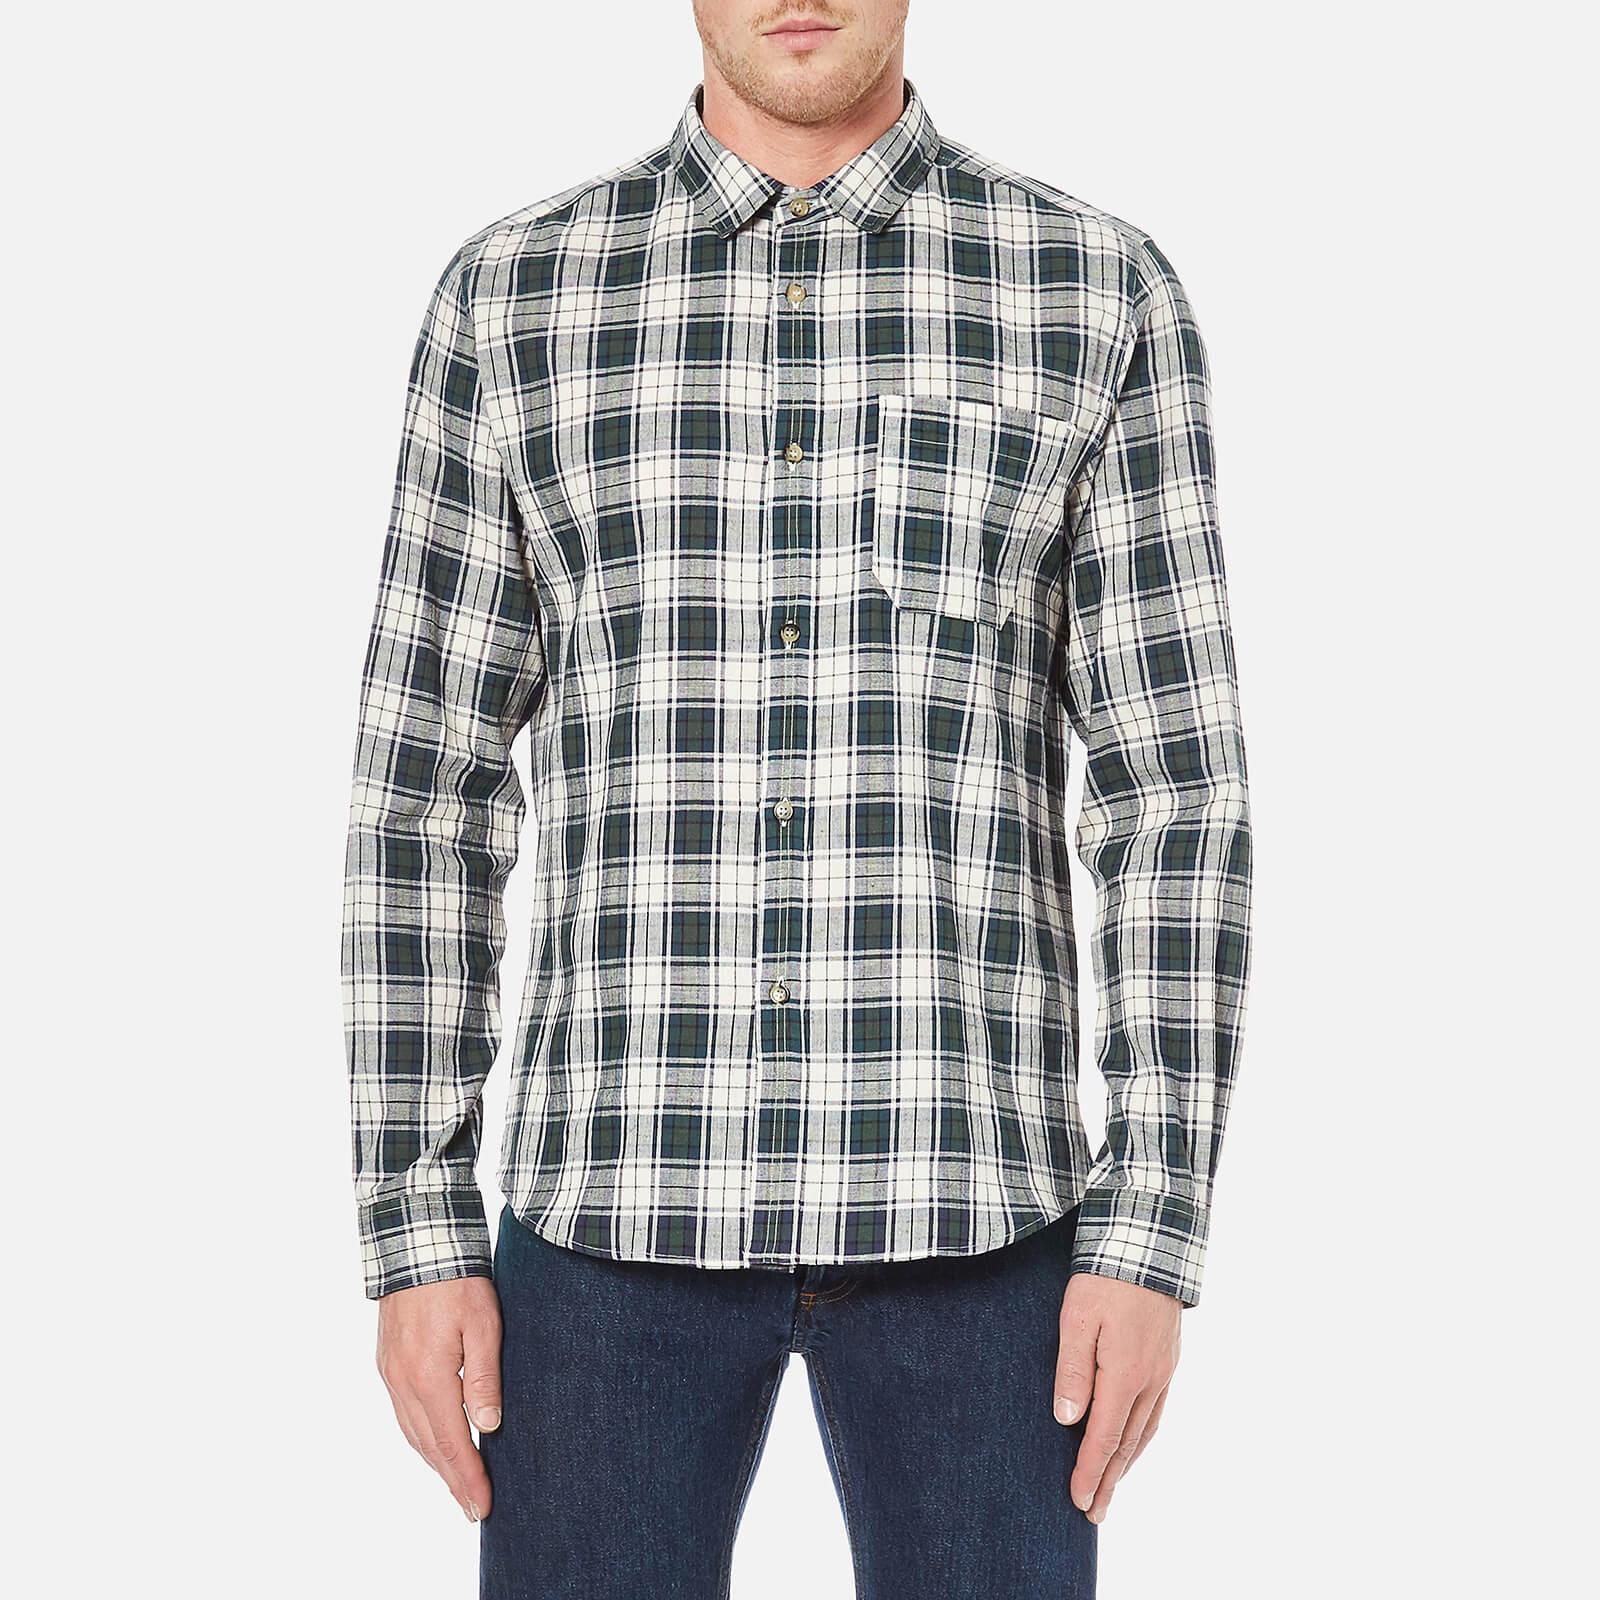 b5a6463ded9f A.P.C. Men's Surchemise Trevor Check Shirt - Ecru - Free UK Delivery over  £50